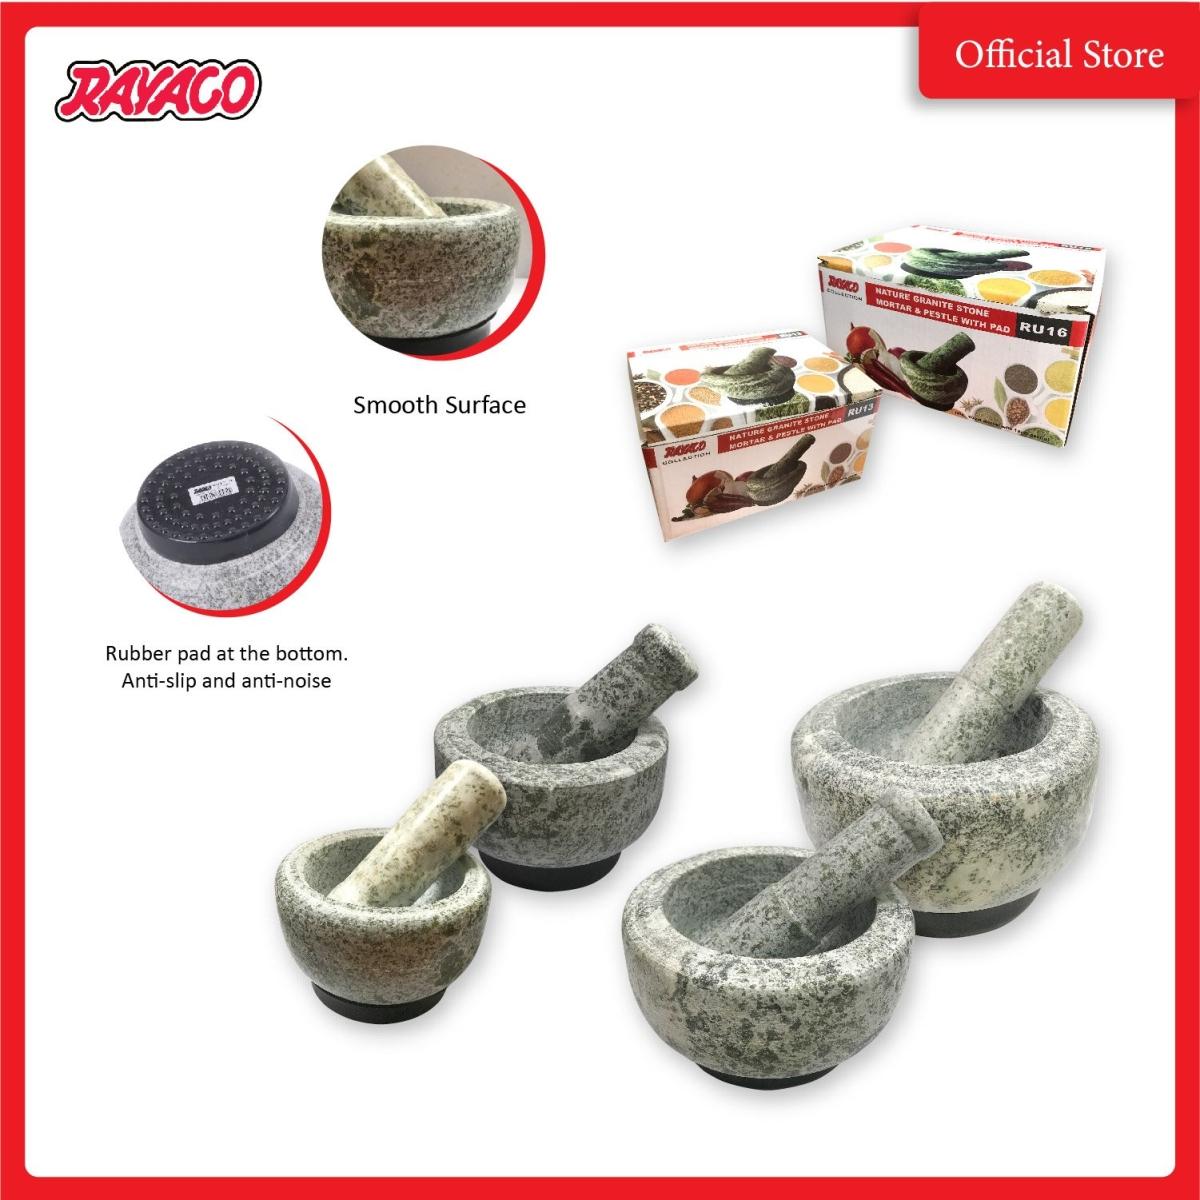 (RU17.5) RU Series - Fine Mortar & Pestle with Pad Stone Series Malaysia, Selangor, Johor Bahru (JB), Kuala Lumpur (KL), Rawang, Kempas Manufacturer, Supplier, Supply, Supplies   Perusahaan Cemerlang Raya Sdn Bhd